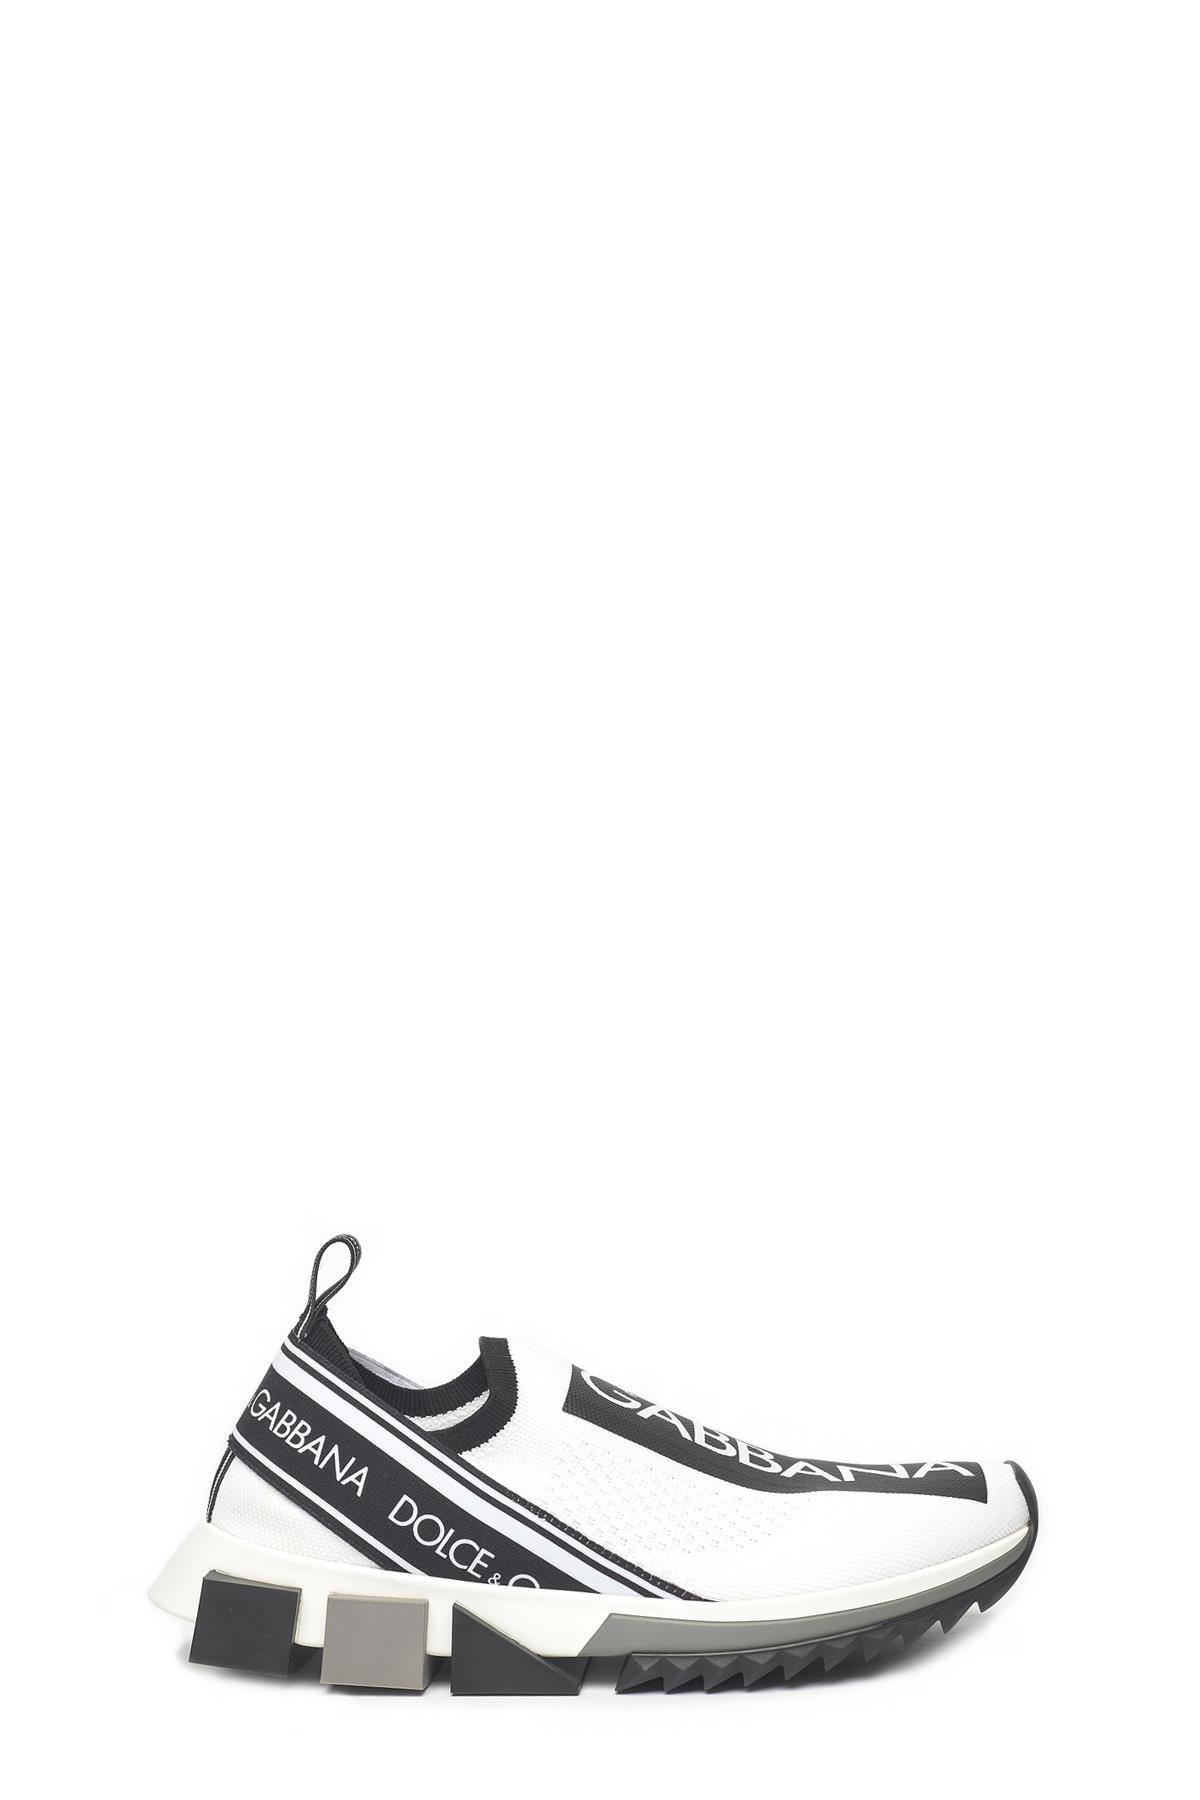 dolce \u0026 gabbana 'Sorrento' sneakers